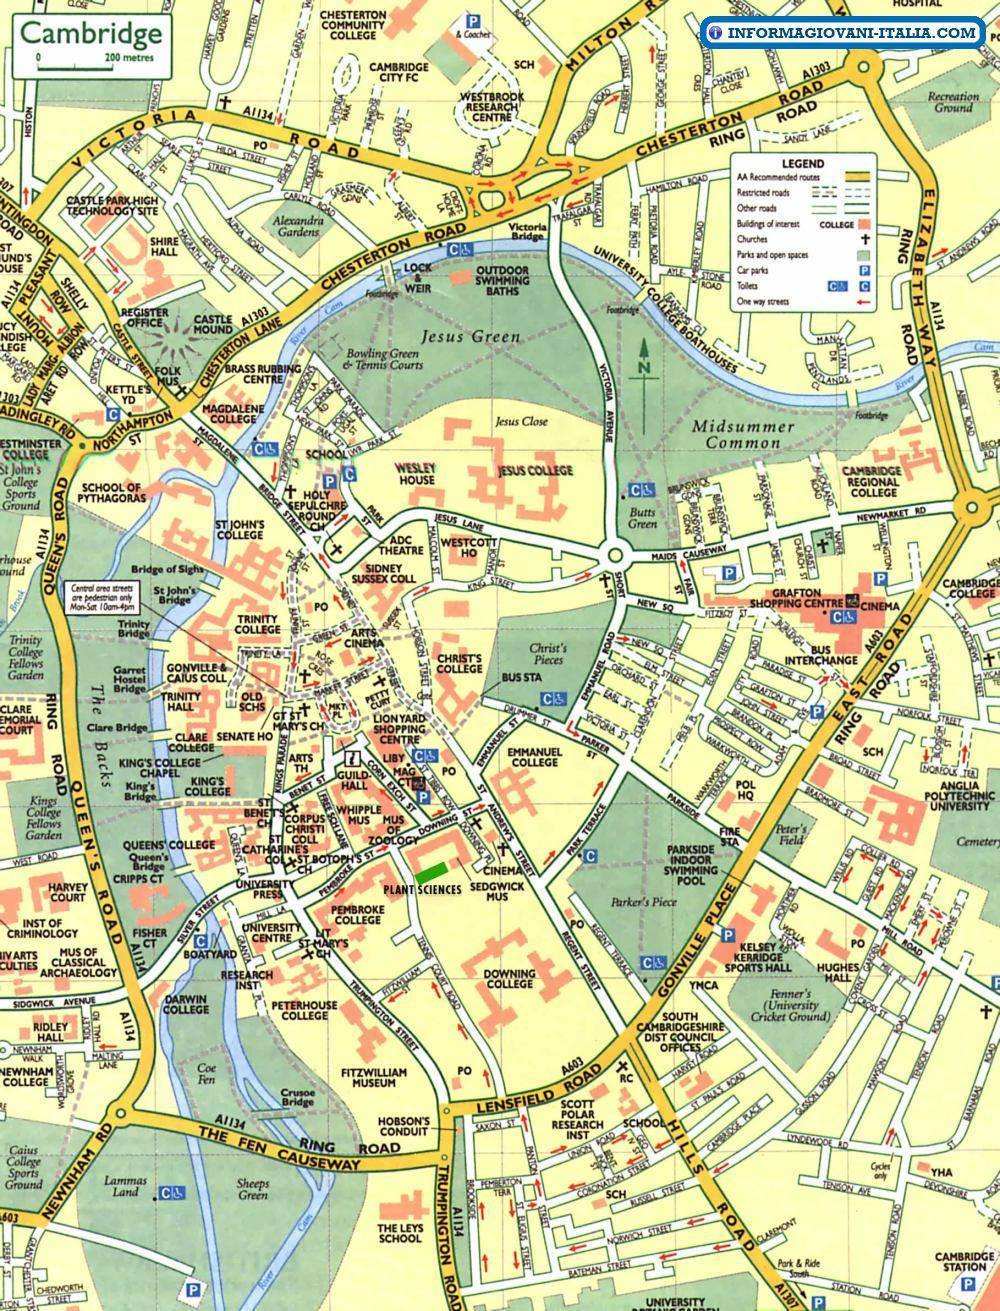 Cartina Di Londra E Dintorni.Mappa Di Cambridge Cartina Di Cambridge